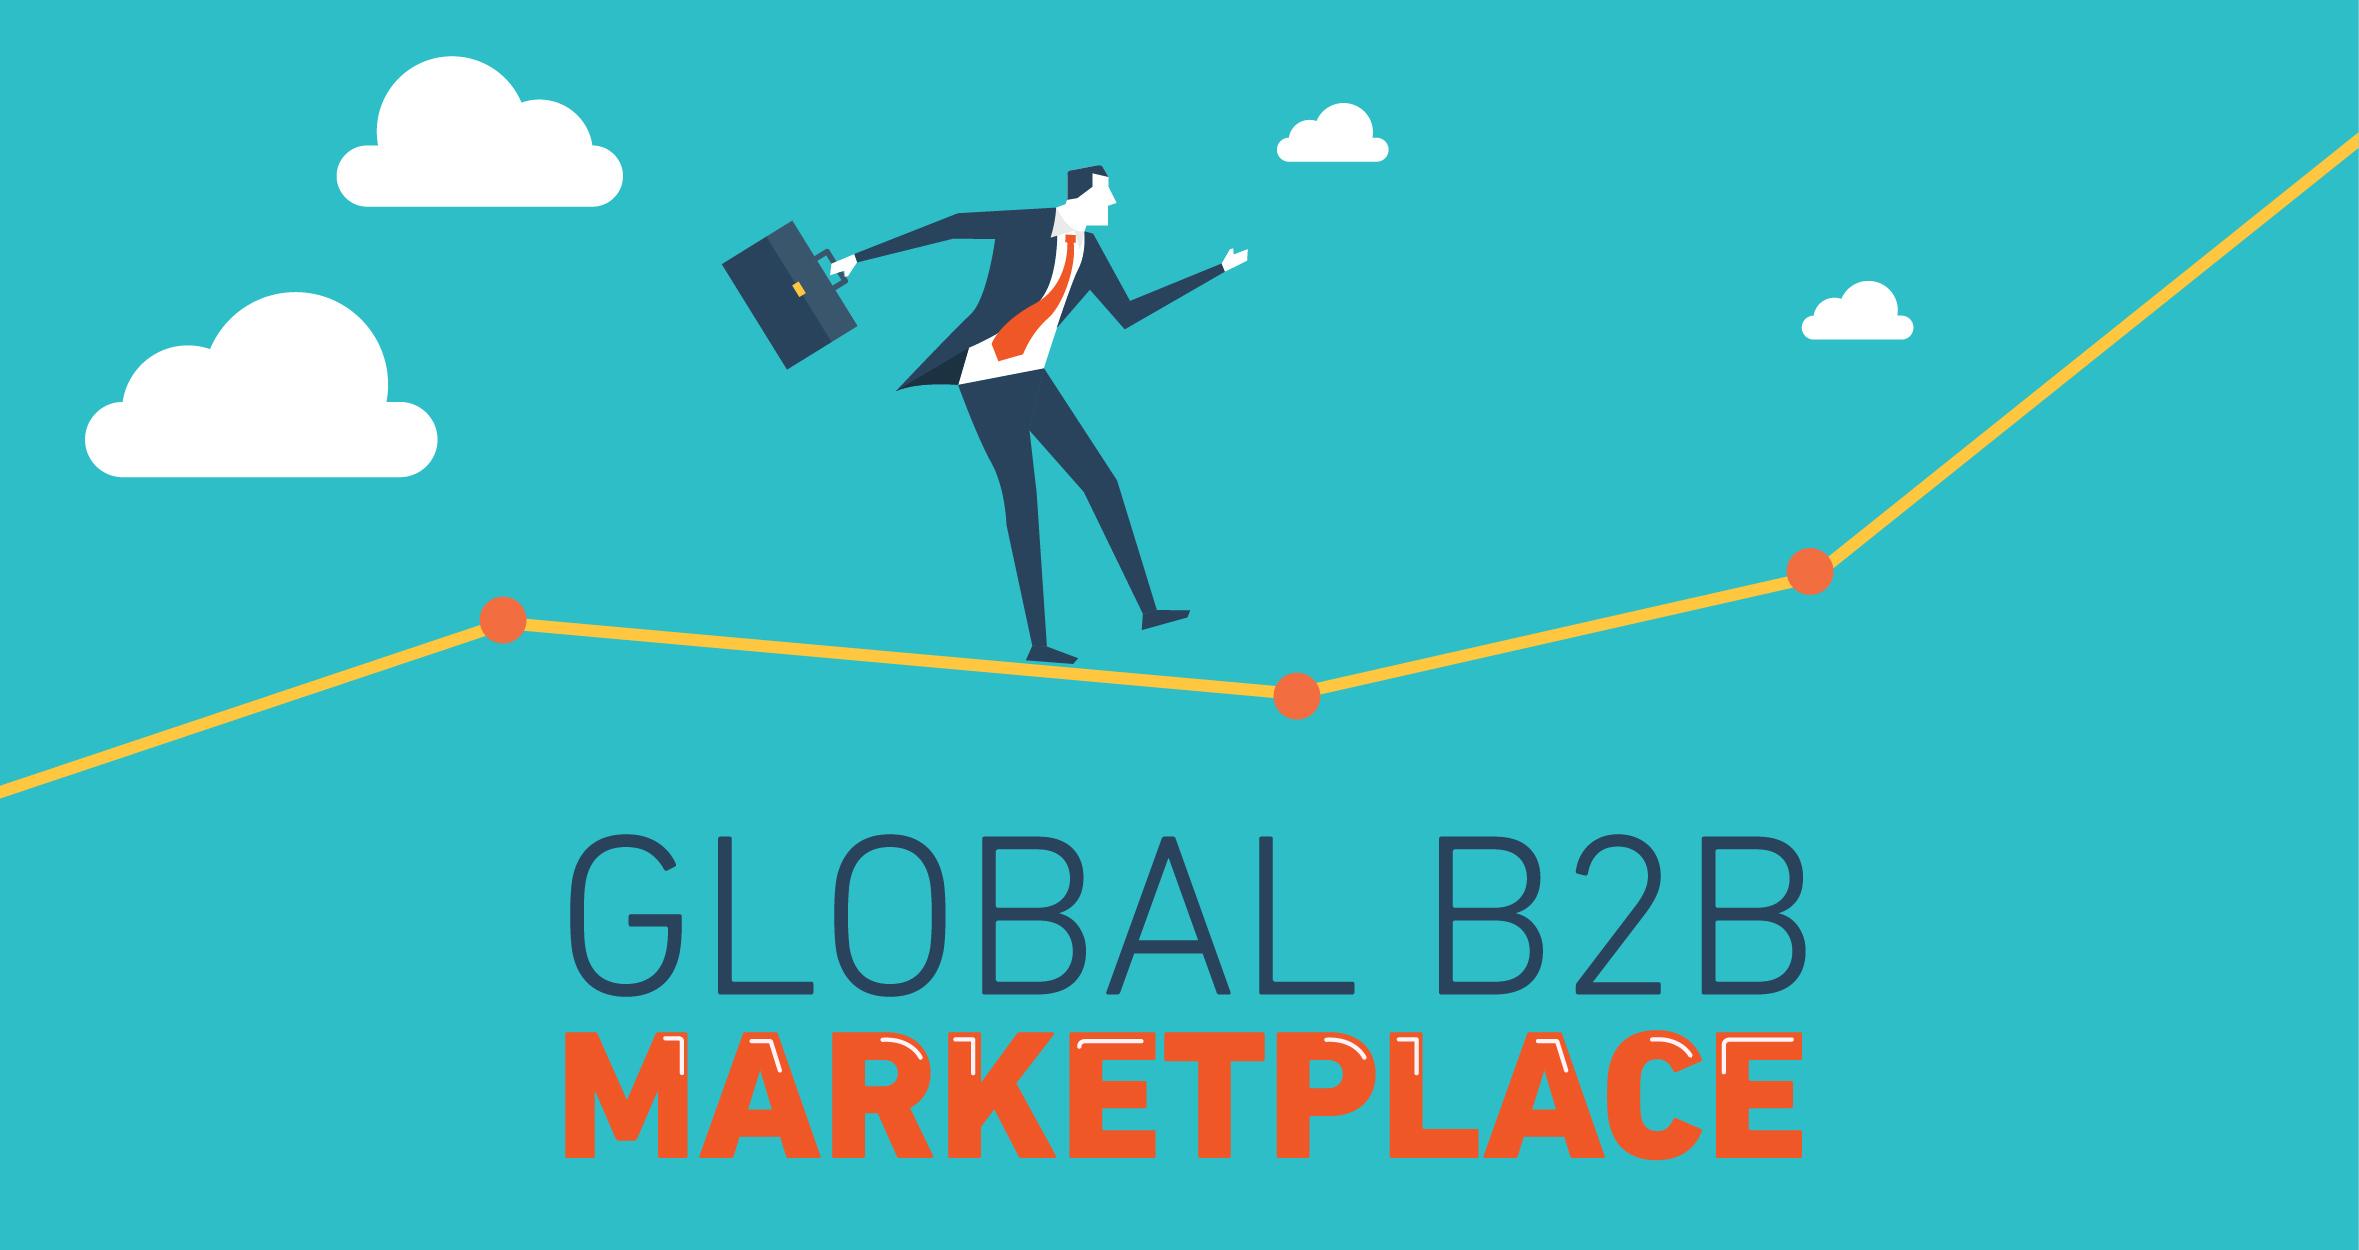 Global-B2B-Marketplace.jpg